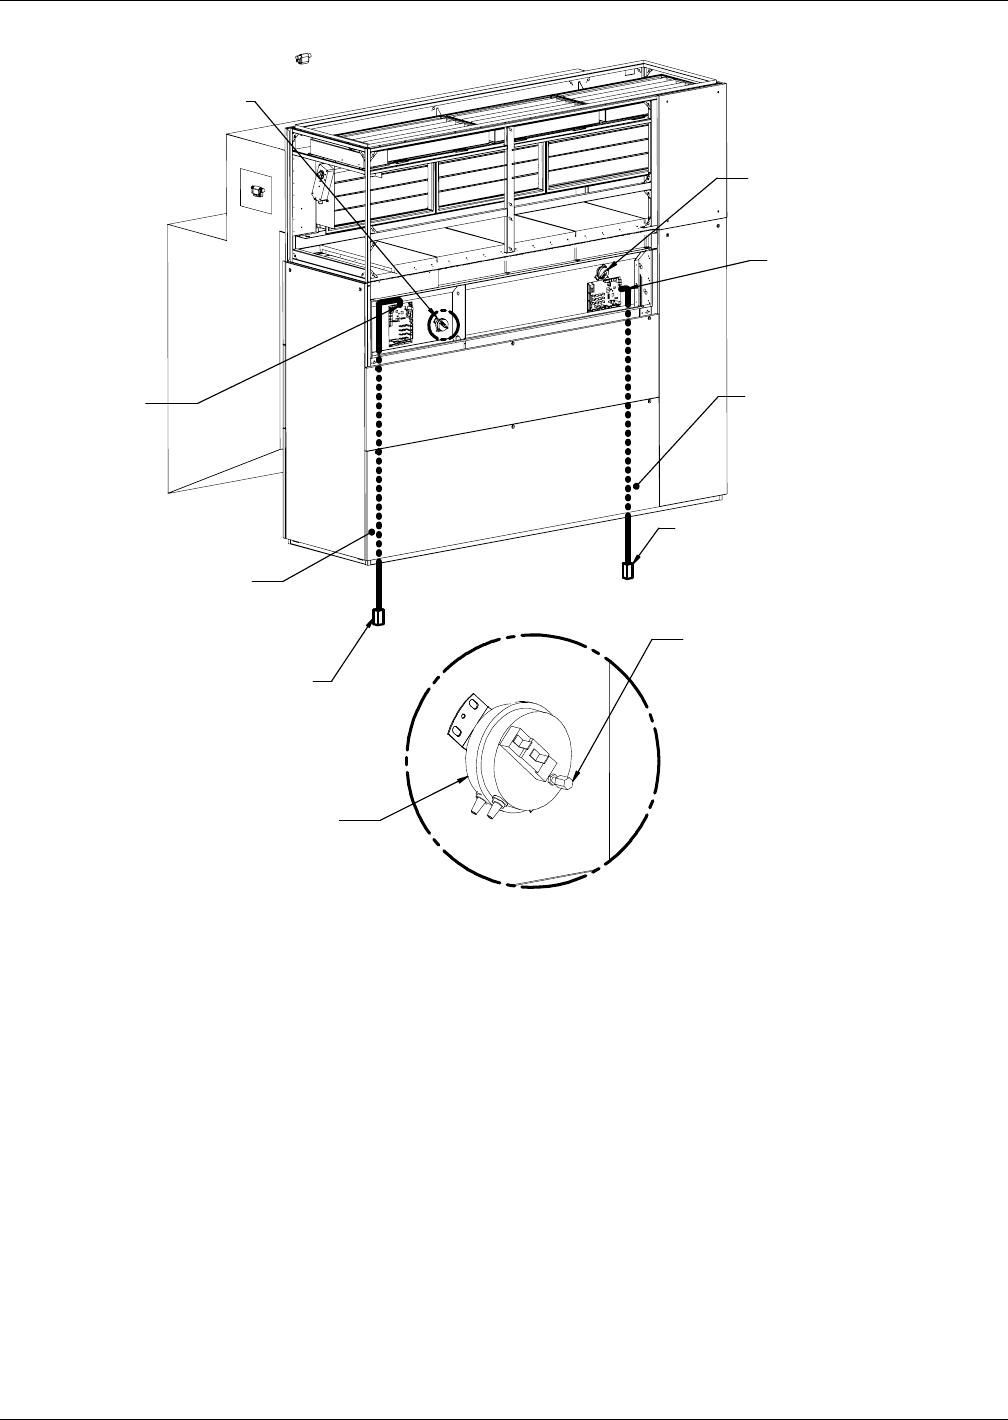 2006 international 4300 air conditioning wiring diagram